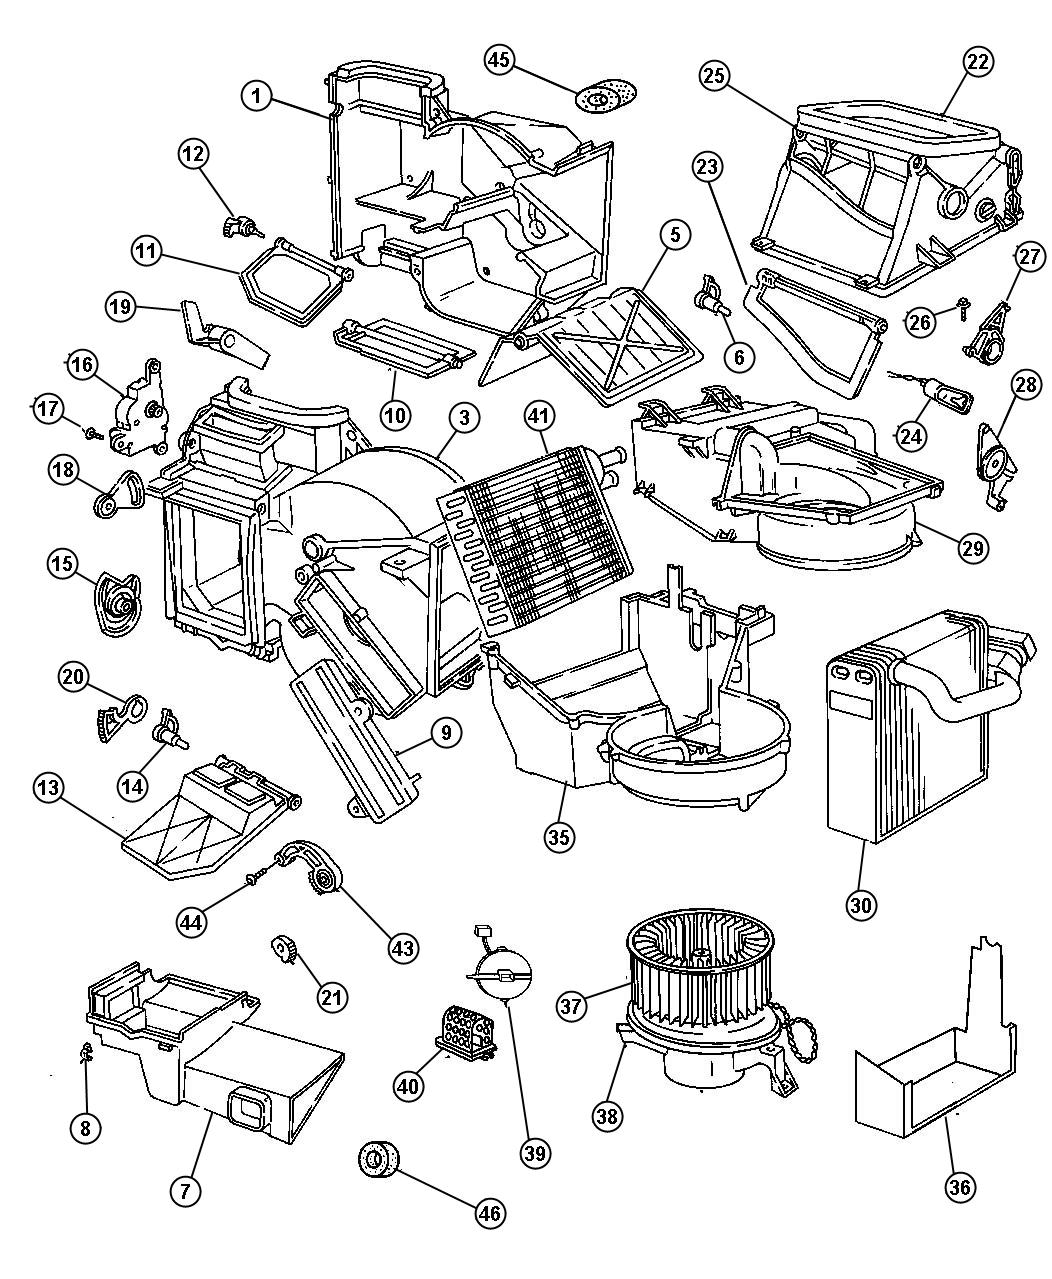 Dodge Stratus Motor Blower With Wheel